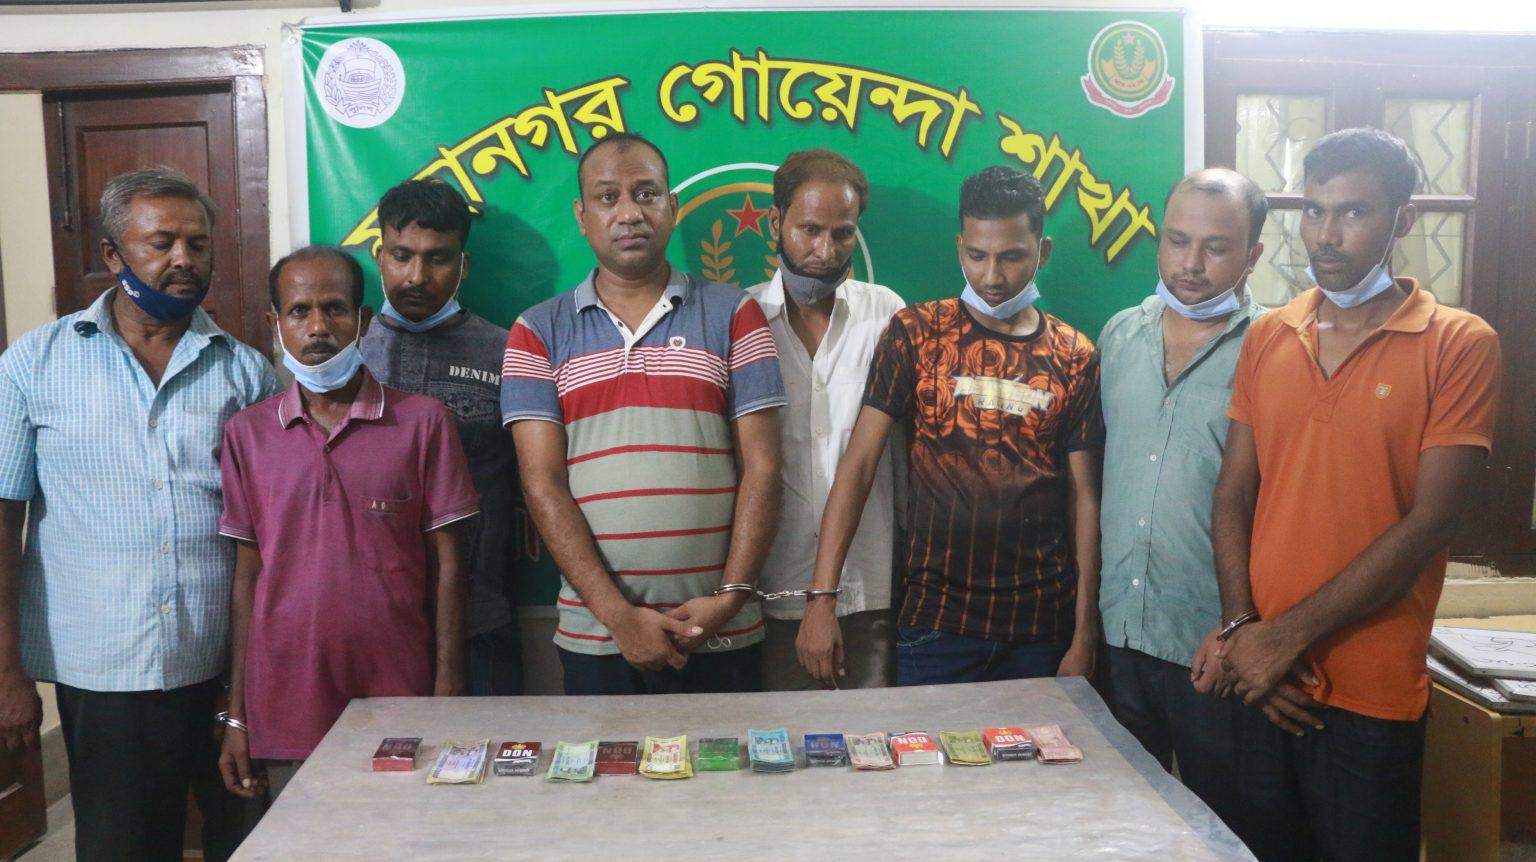 Nine gamblers held in Rajshahi